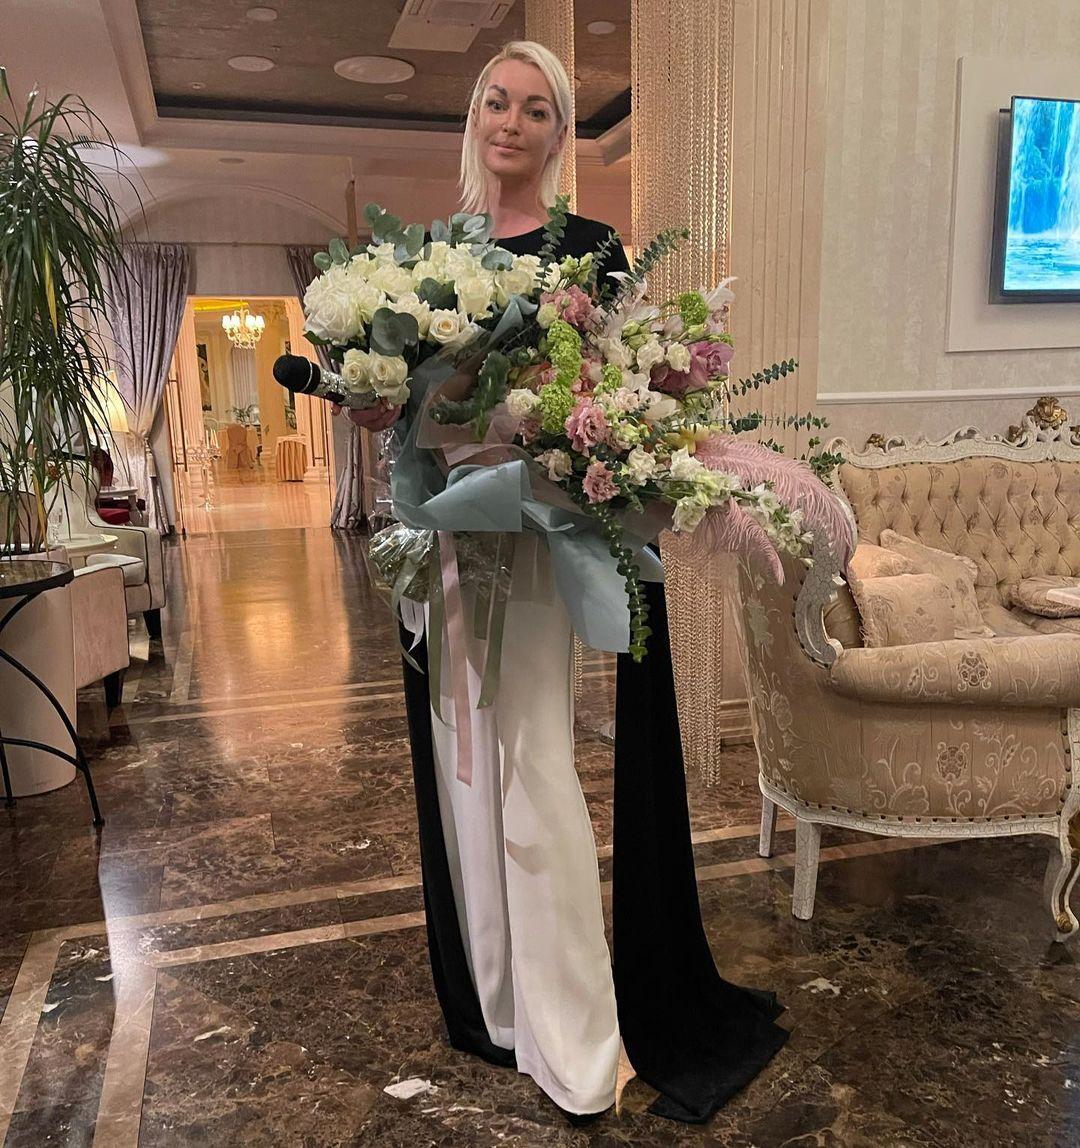 Alla Pugacheva allowed Anastasia Volochkova to sing her song